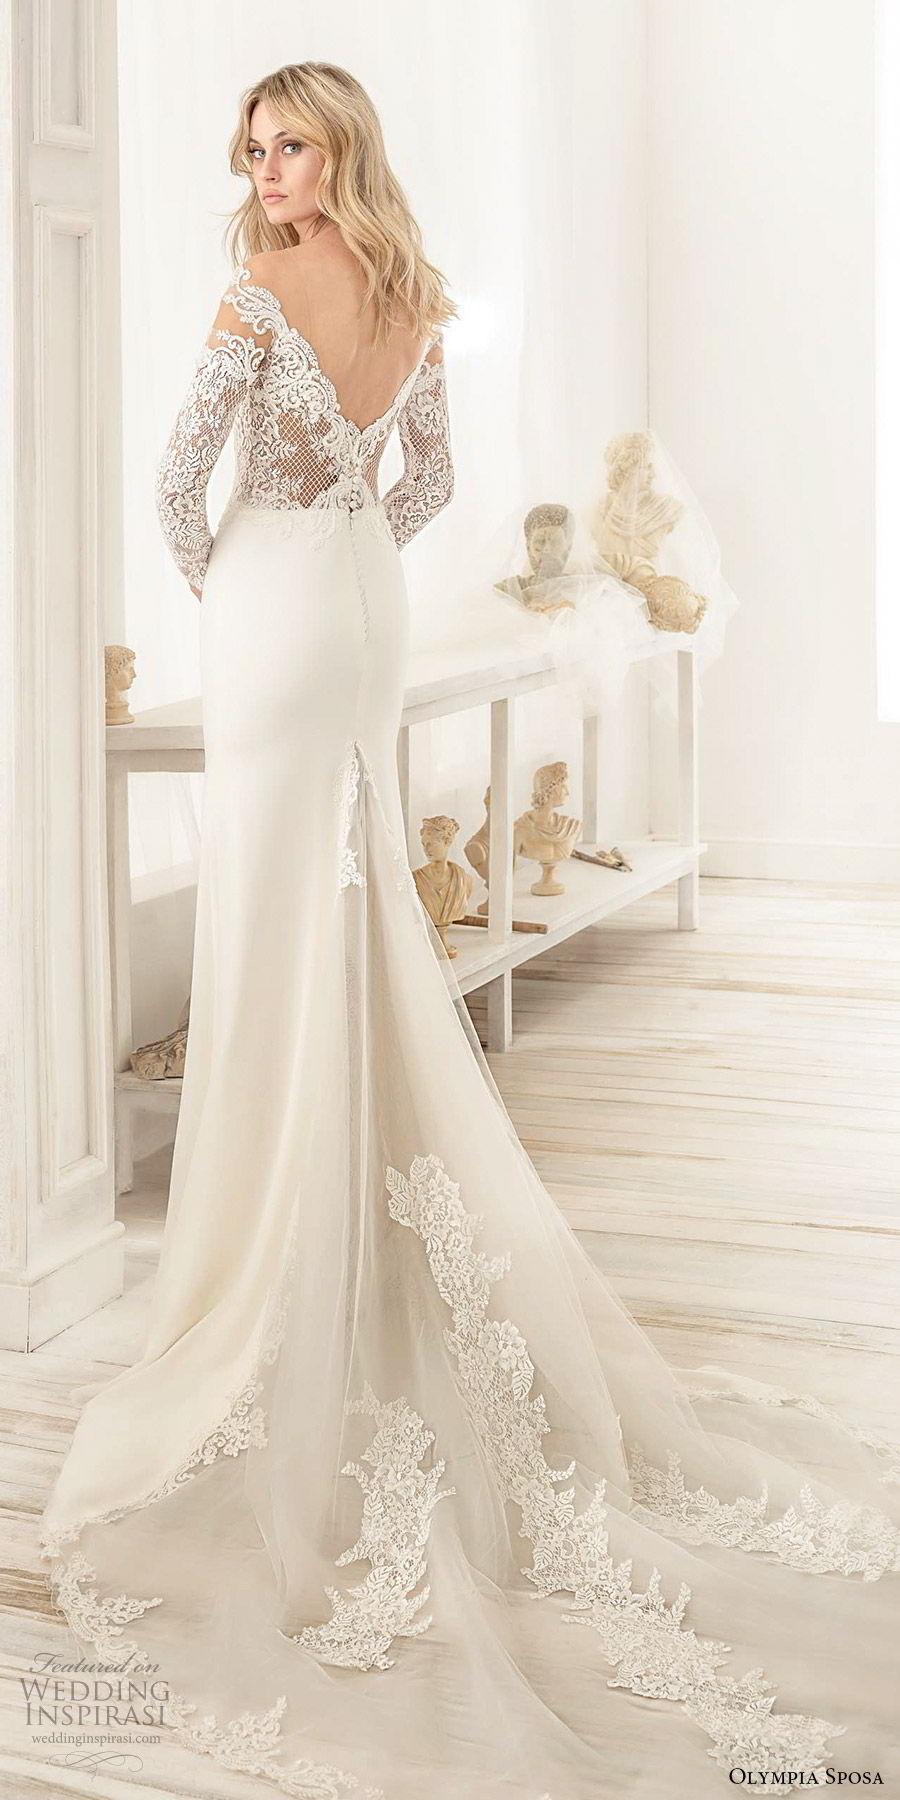 olympia sposa 2020 bridal off shoulder illusion long sleeves heavily embellished bodice sheath wedding dress (9) elegant sexy v back cathedral train bv